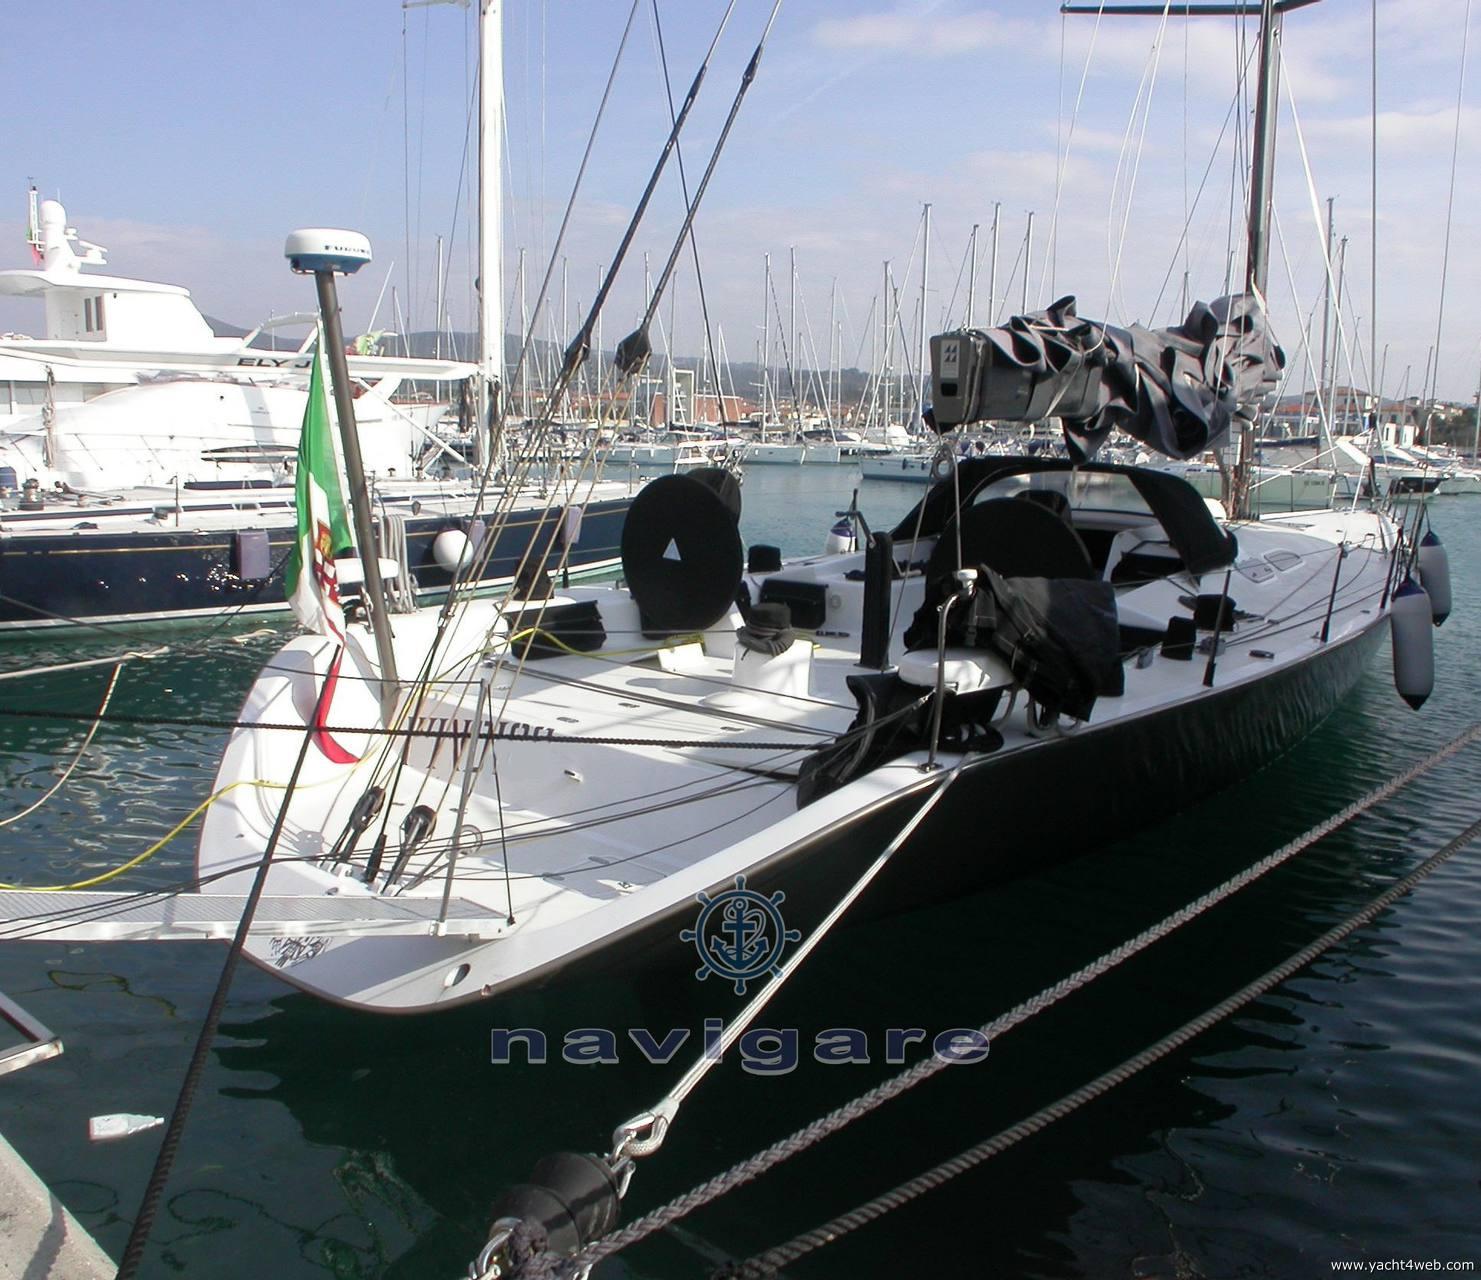 BAKEWELL WHITE YACHT Pocket maxi 67 Sail cruiser used